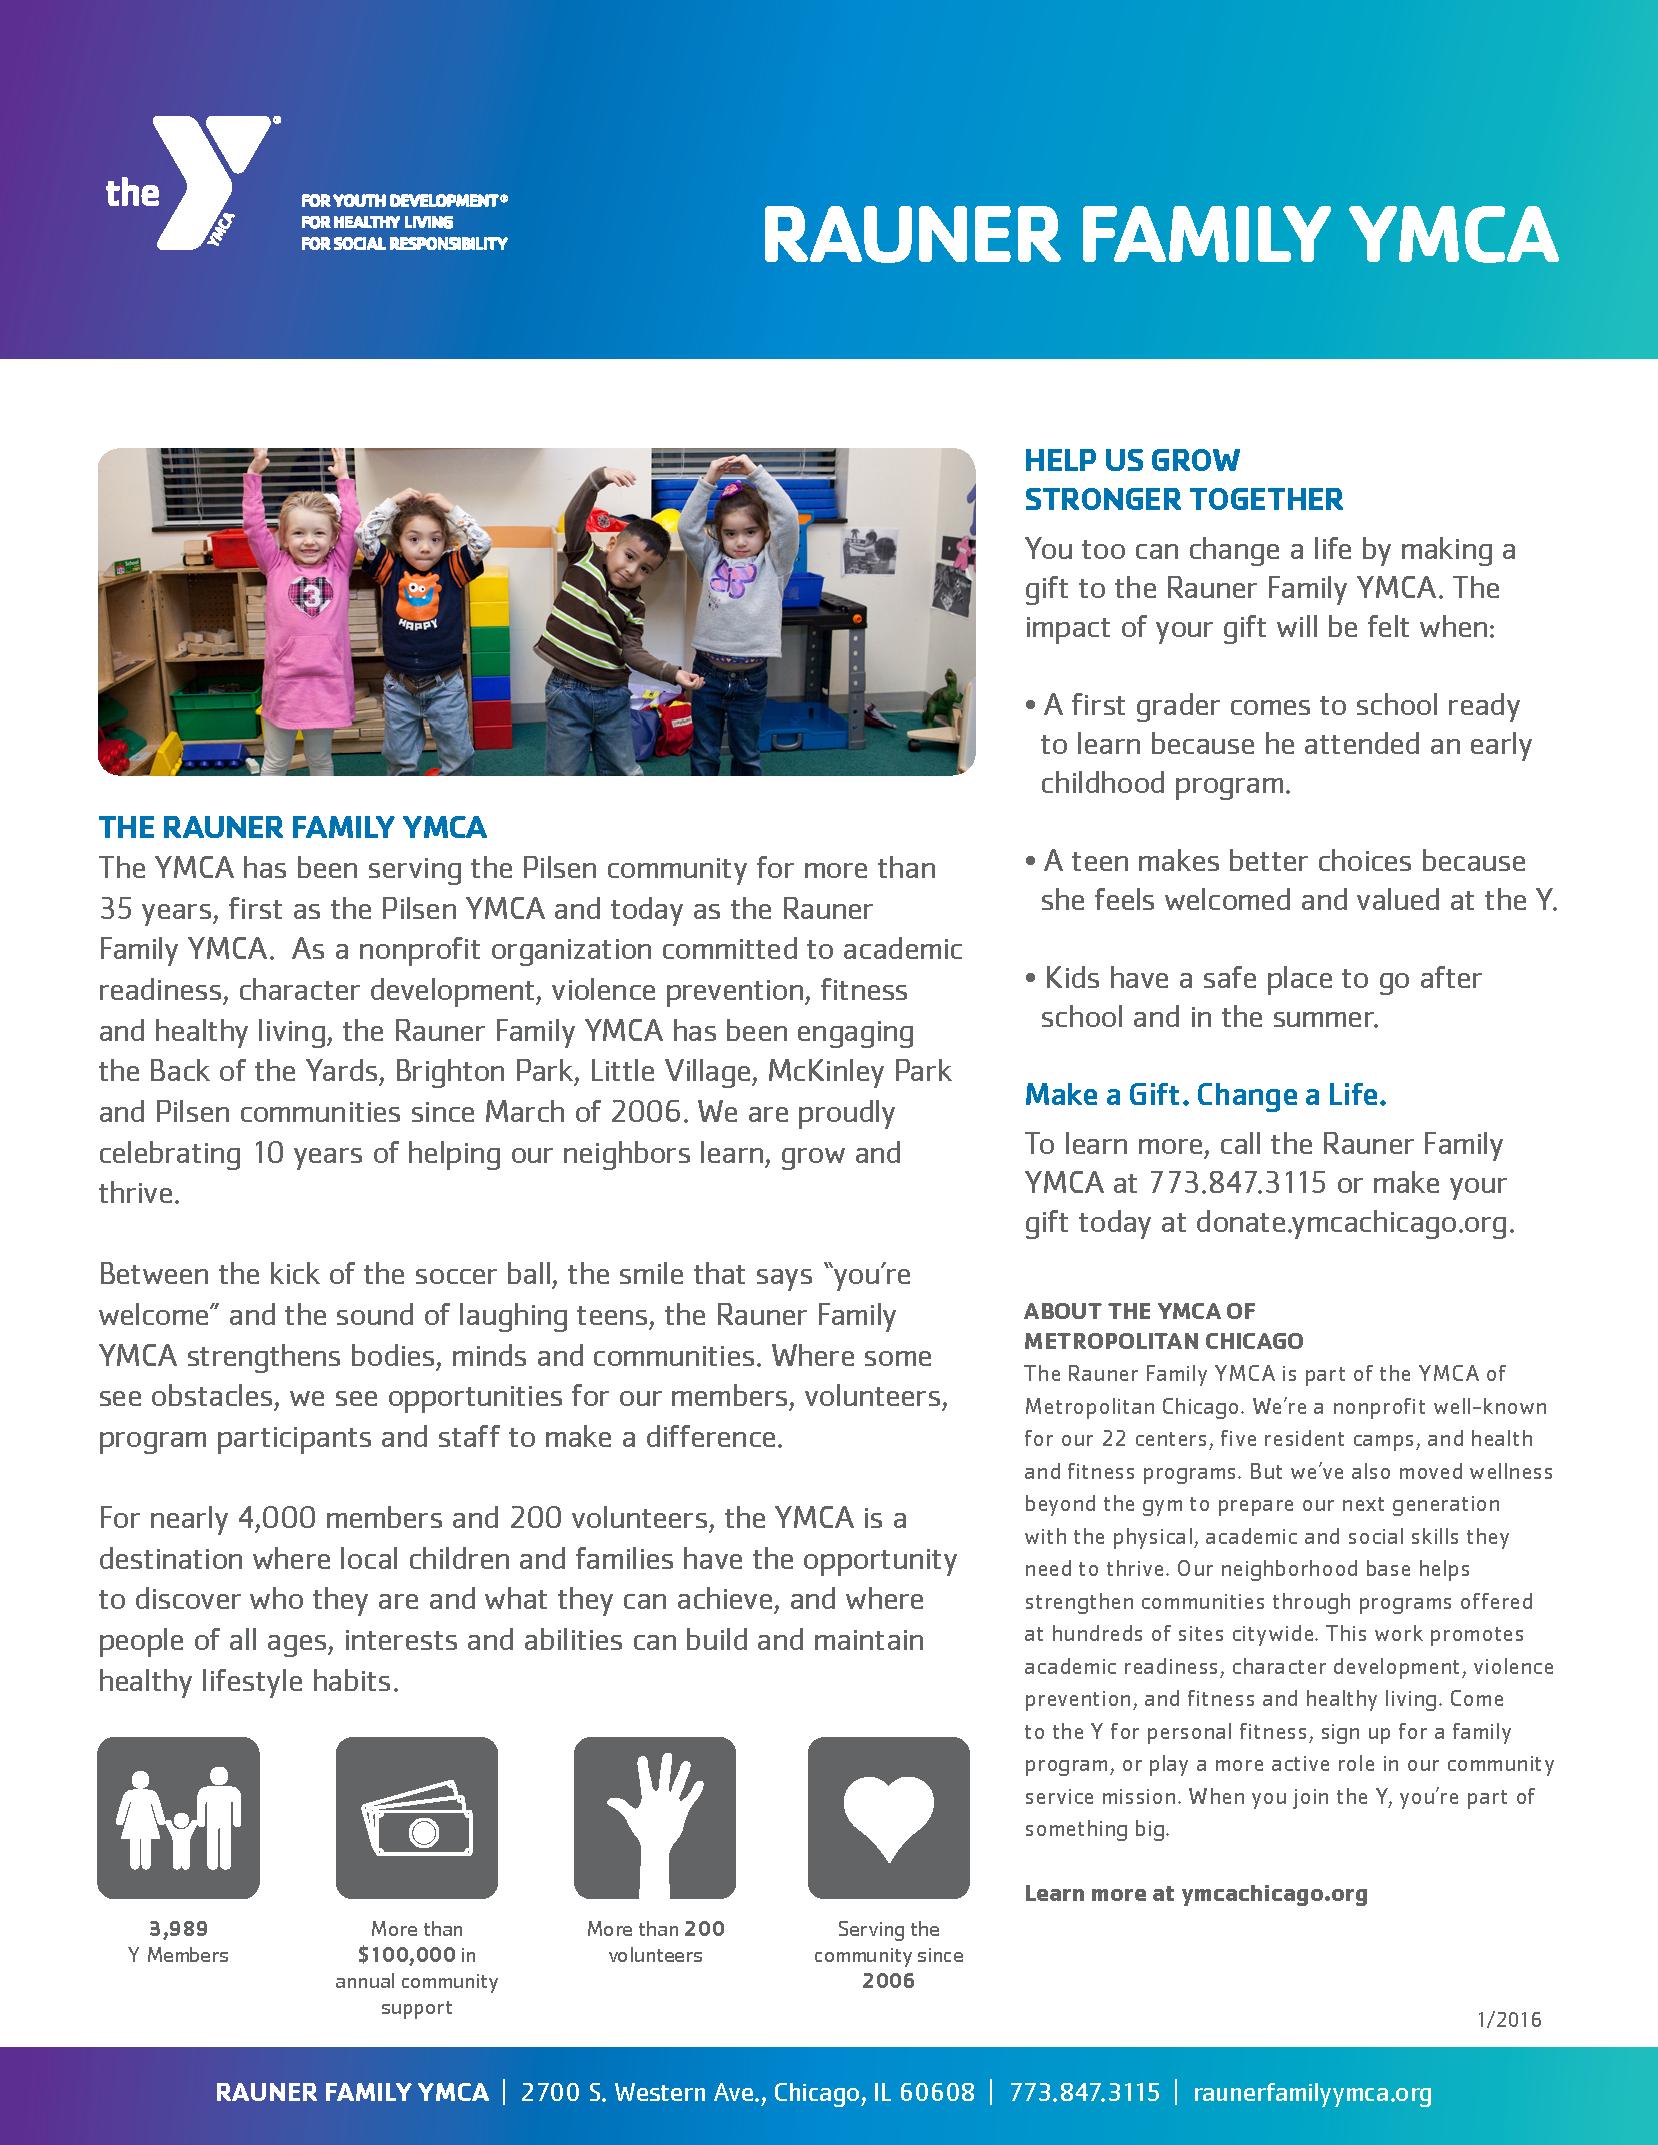 Rauner Family YMCA one-sheet, side 2